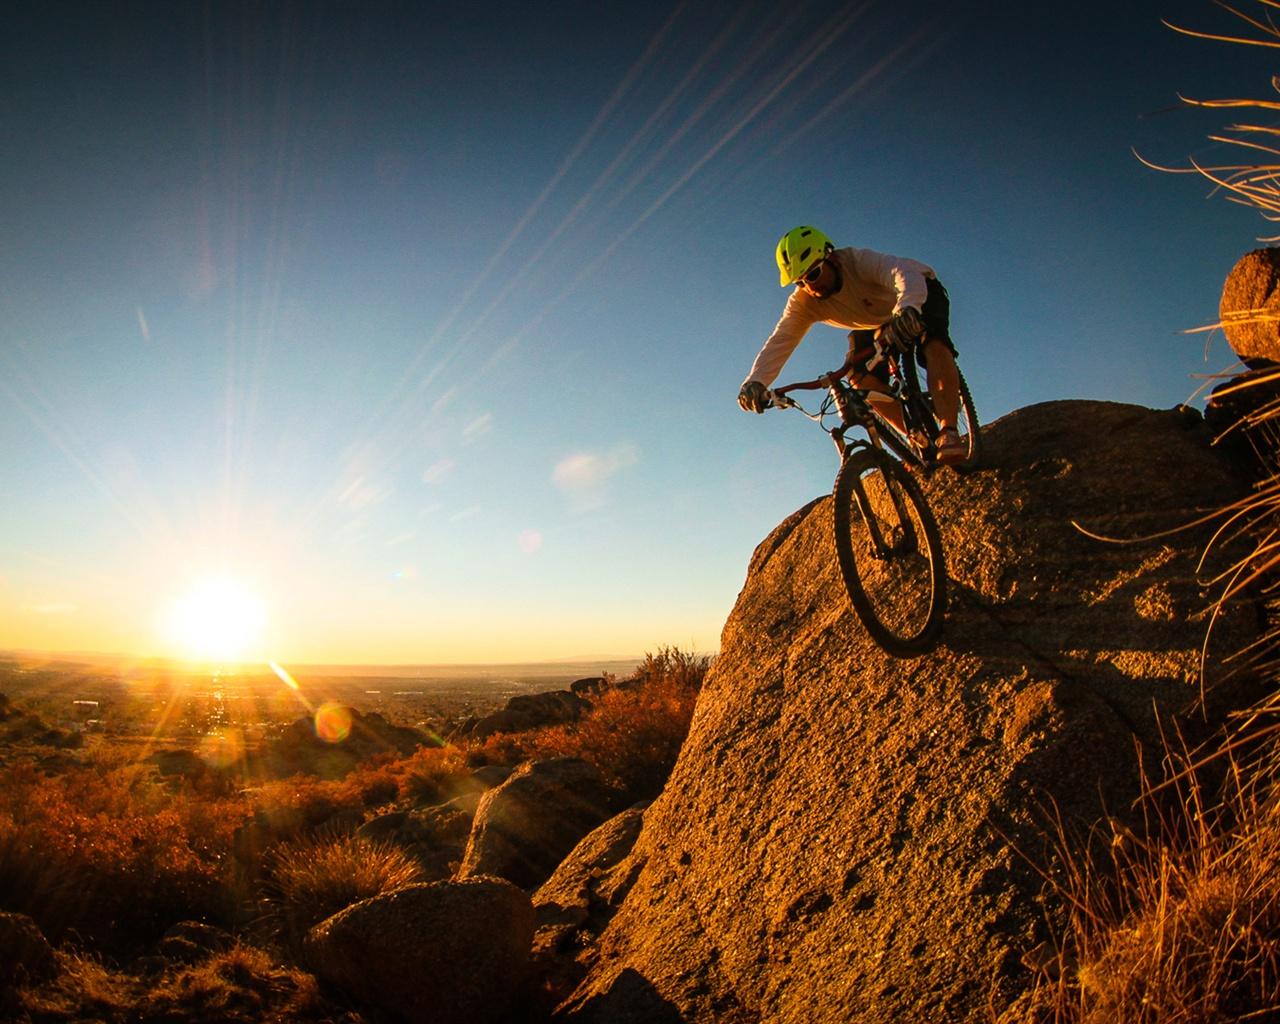 Extreme sports mountain bike 1280x1024jpg 1280x1024